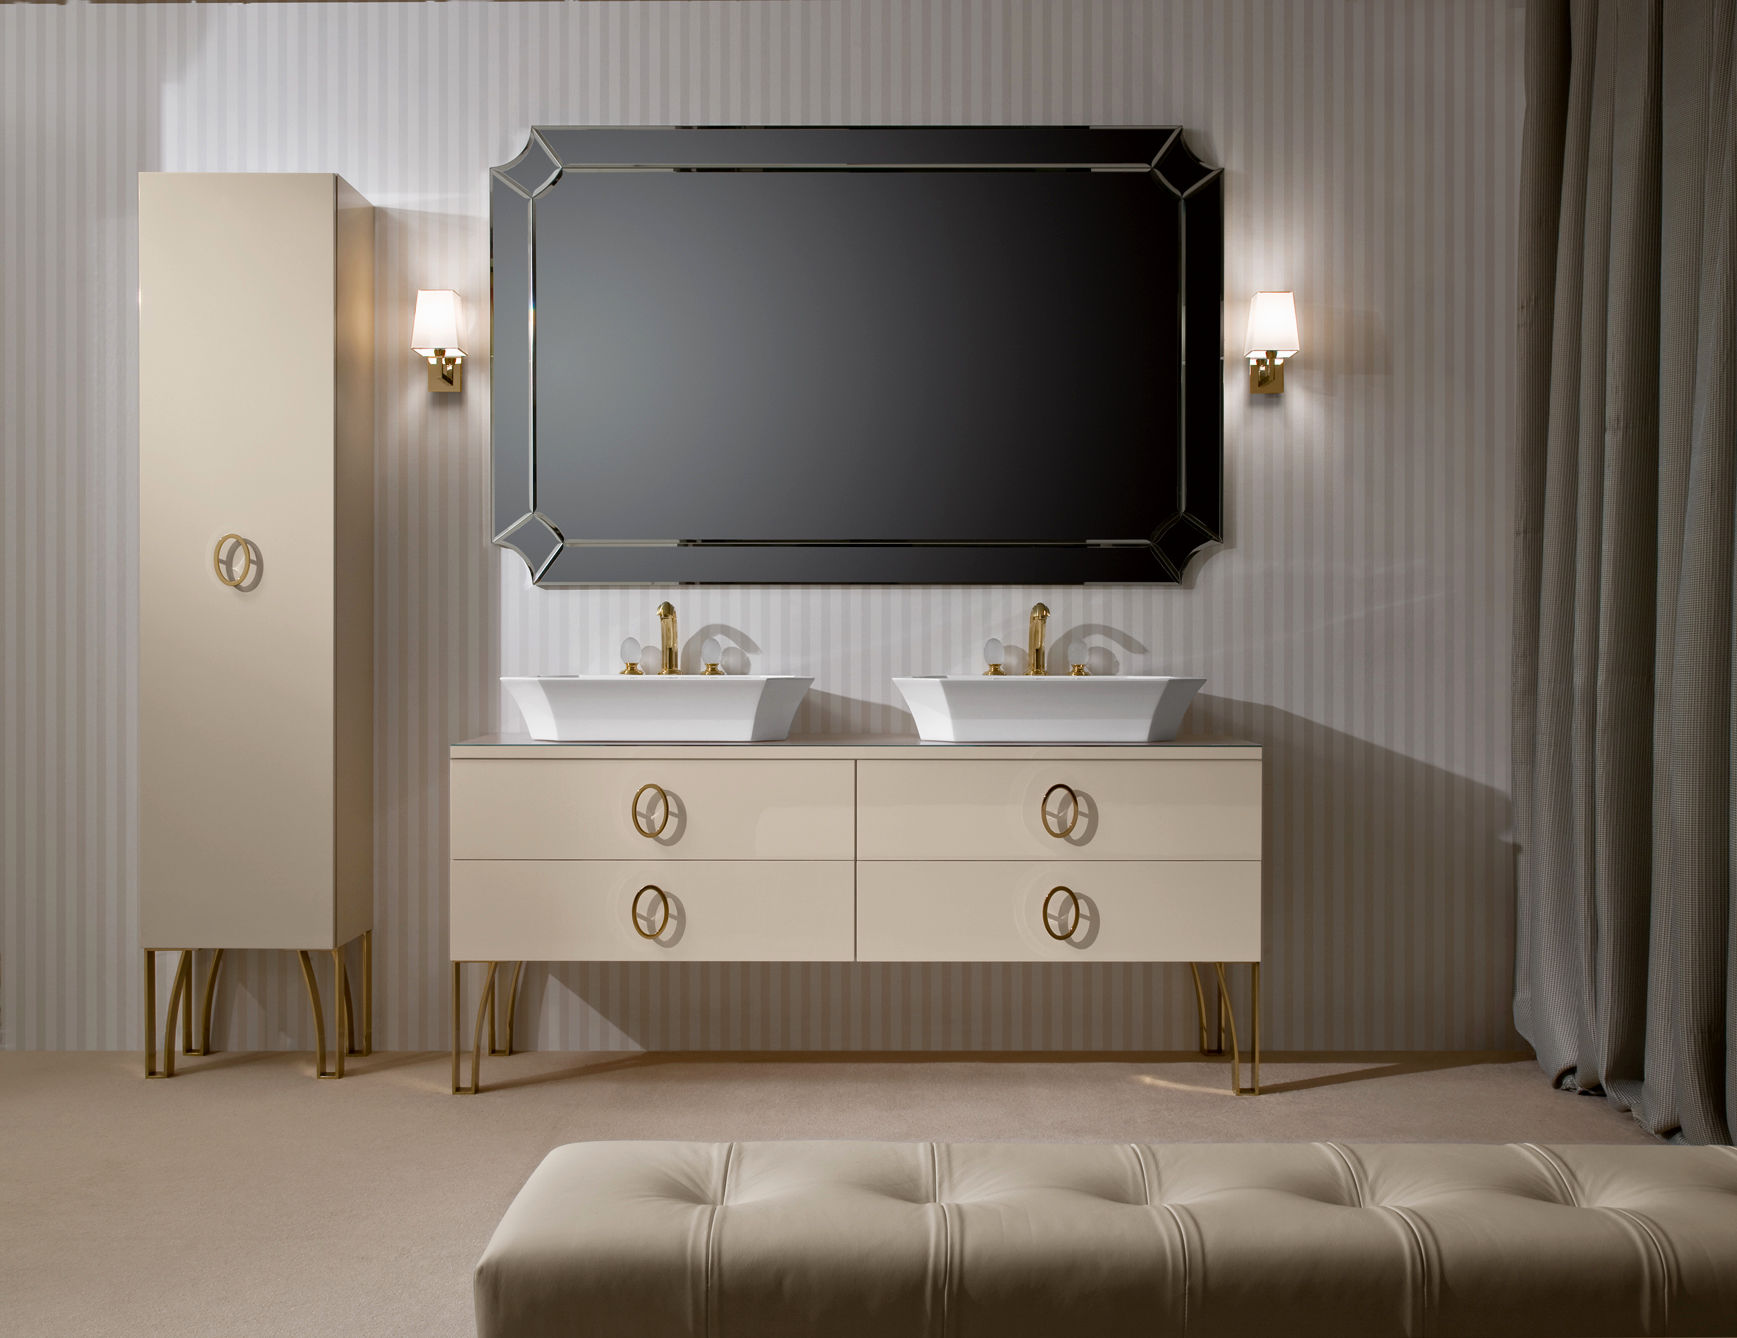 fantastic italian bathroom vanities image-Fascinating Italian Bathroom Vanities Design